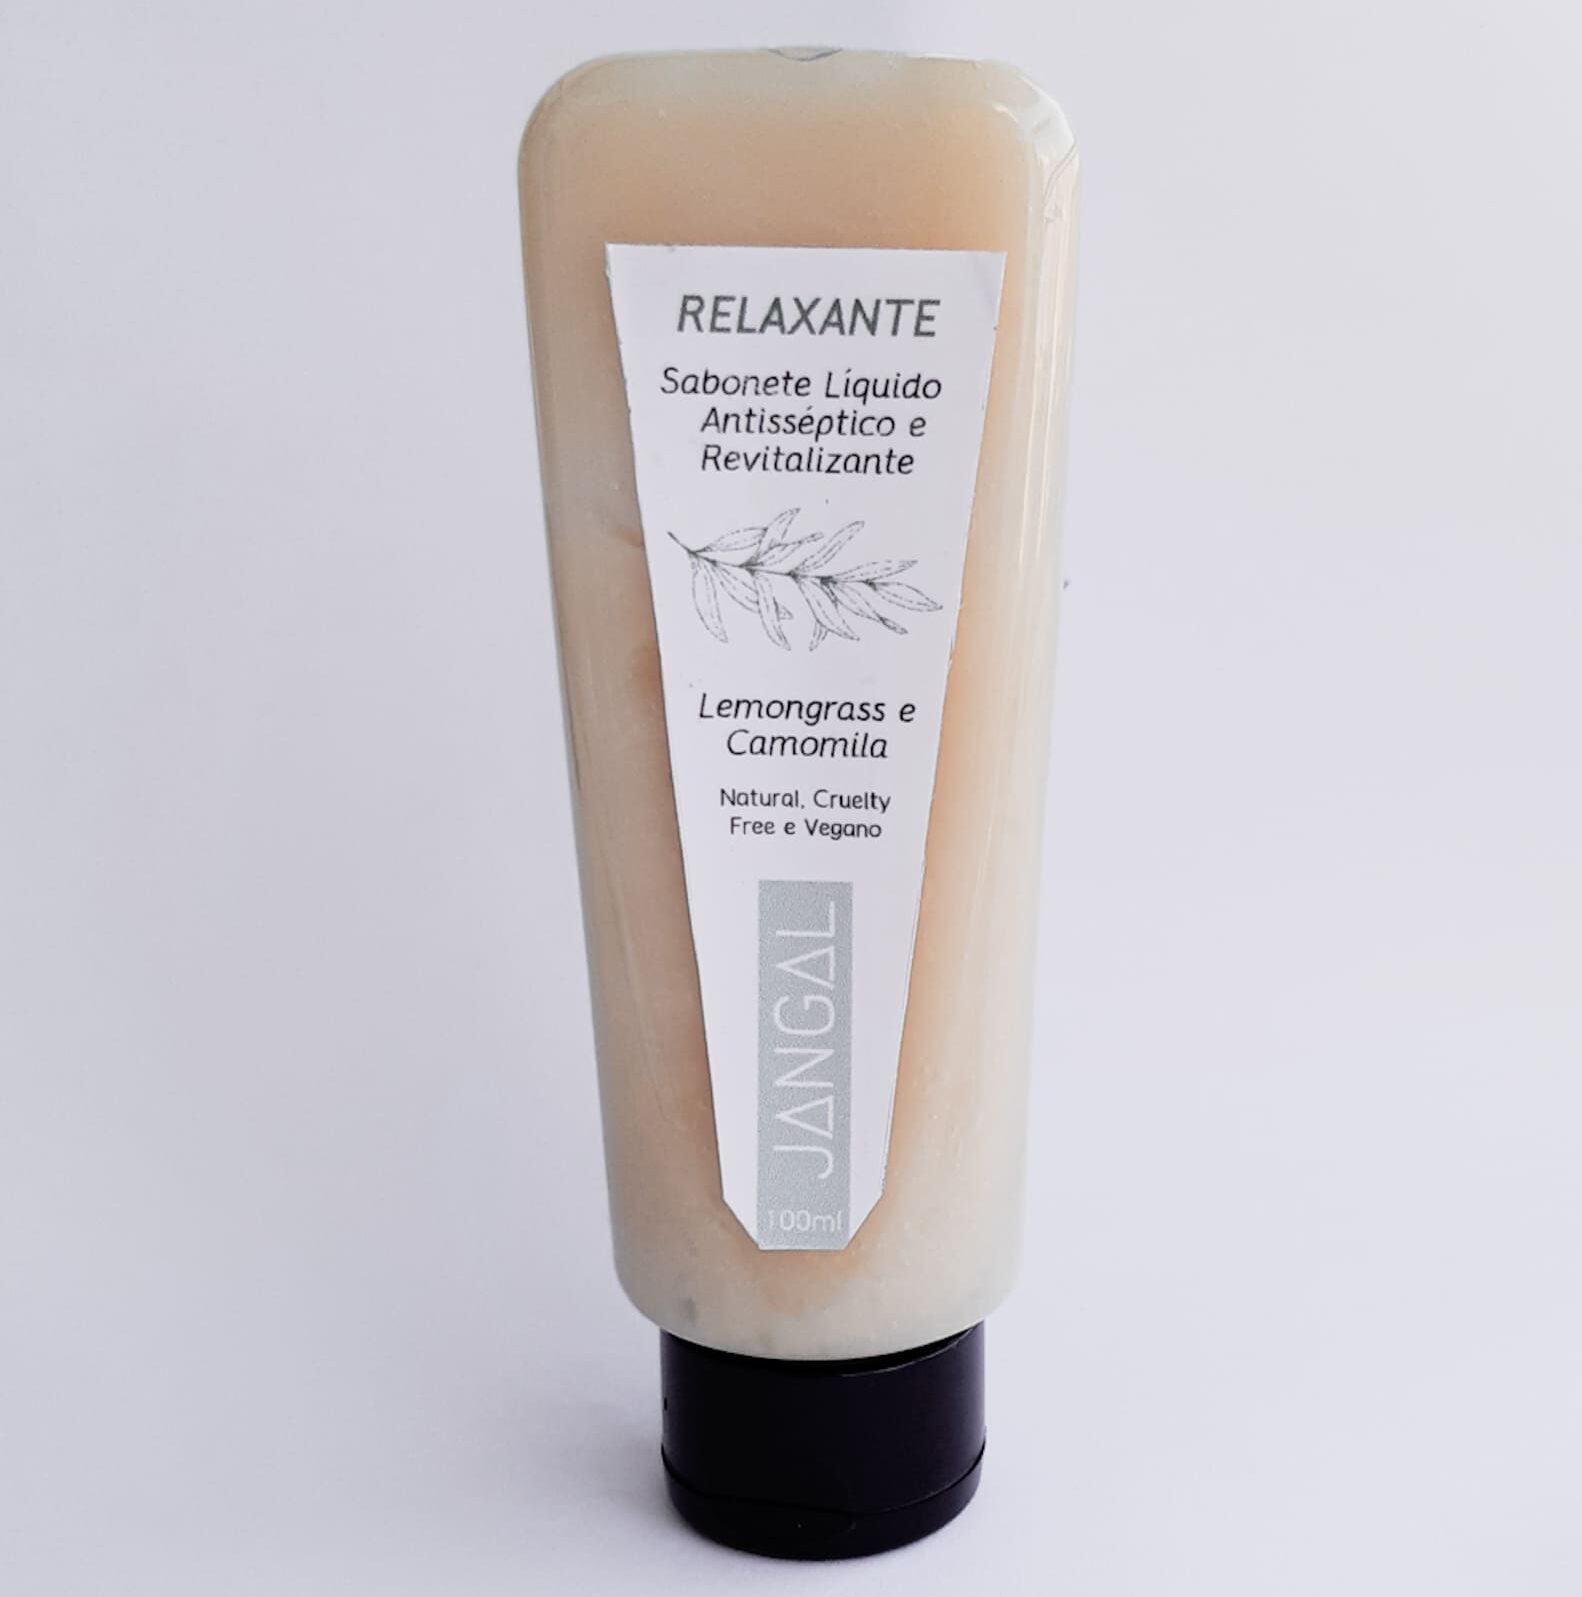 sabonete liquido natural relaxante jangal orgânico vegano